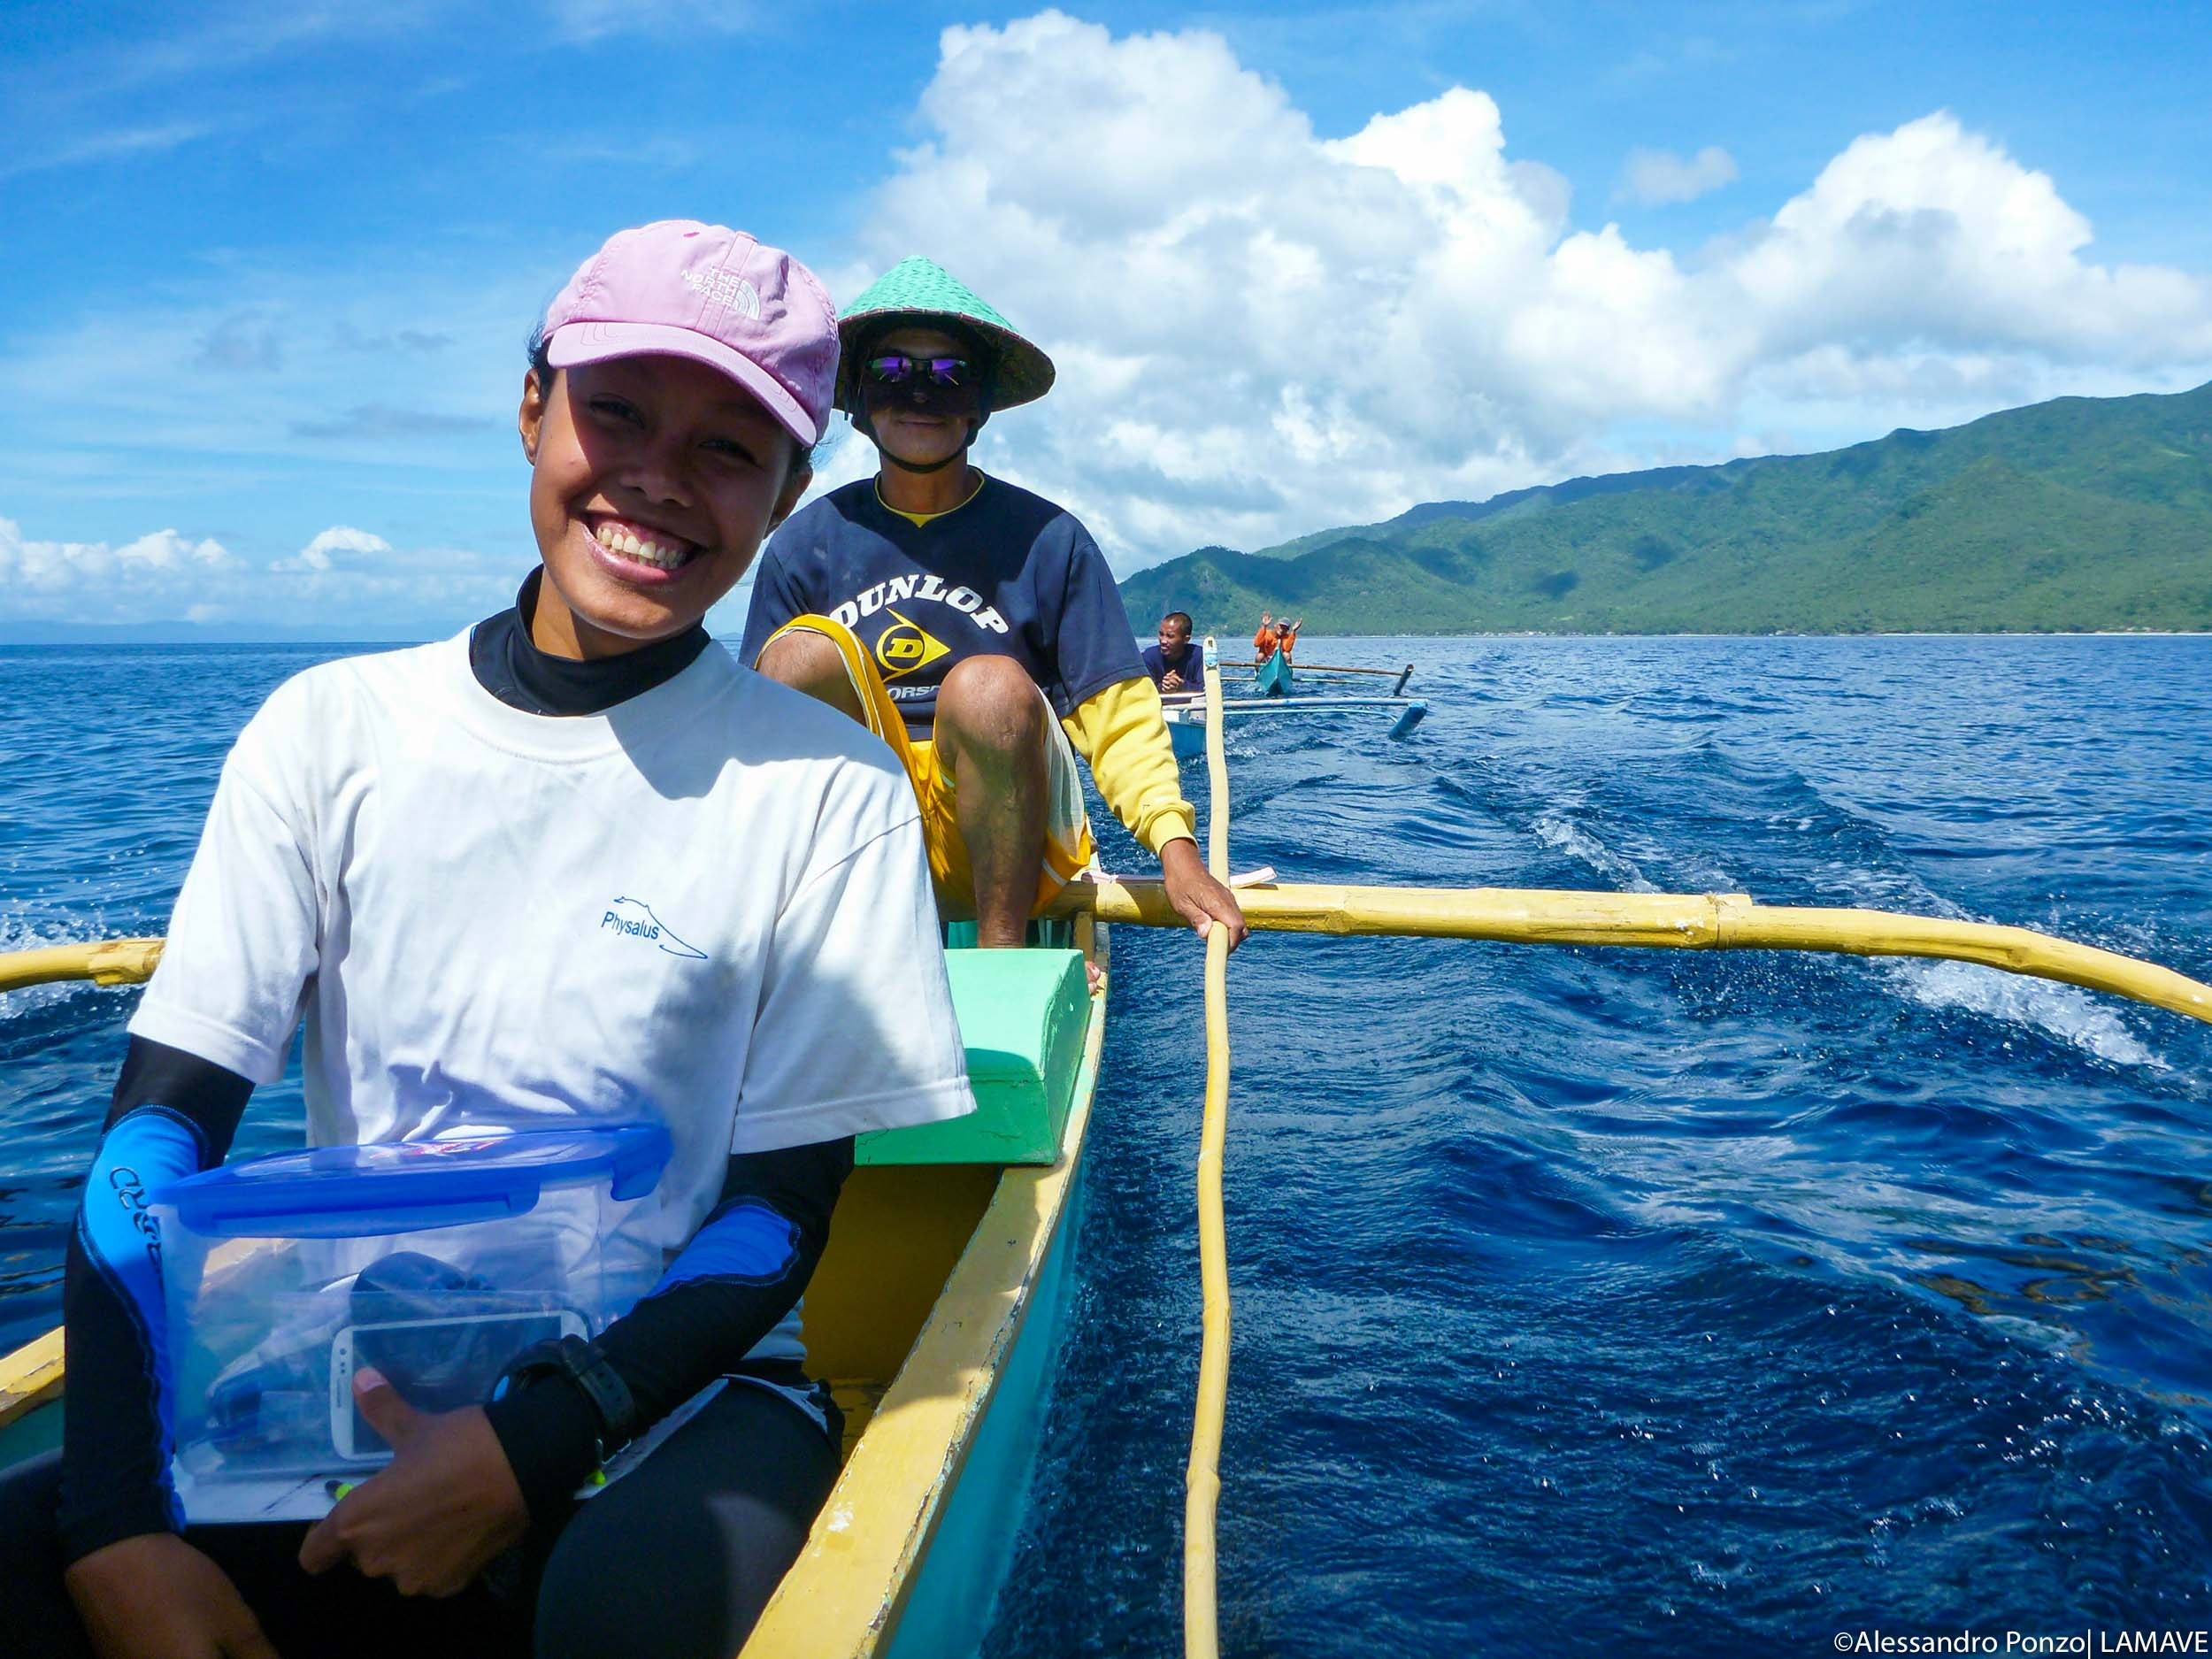 jess-leyte-whale-shark-philippines-lamave.jpg